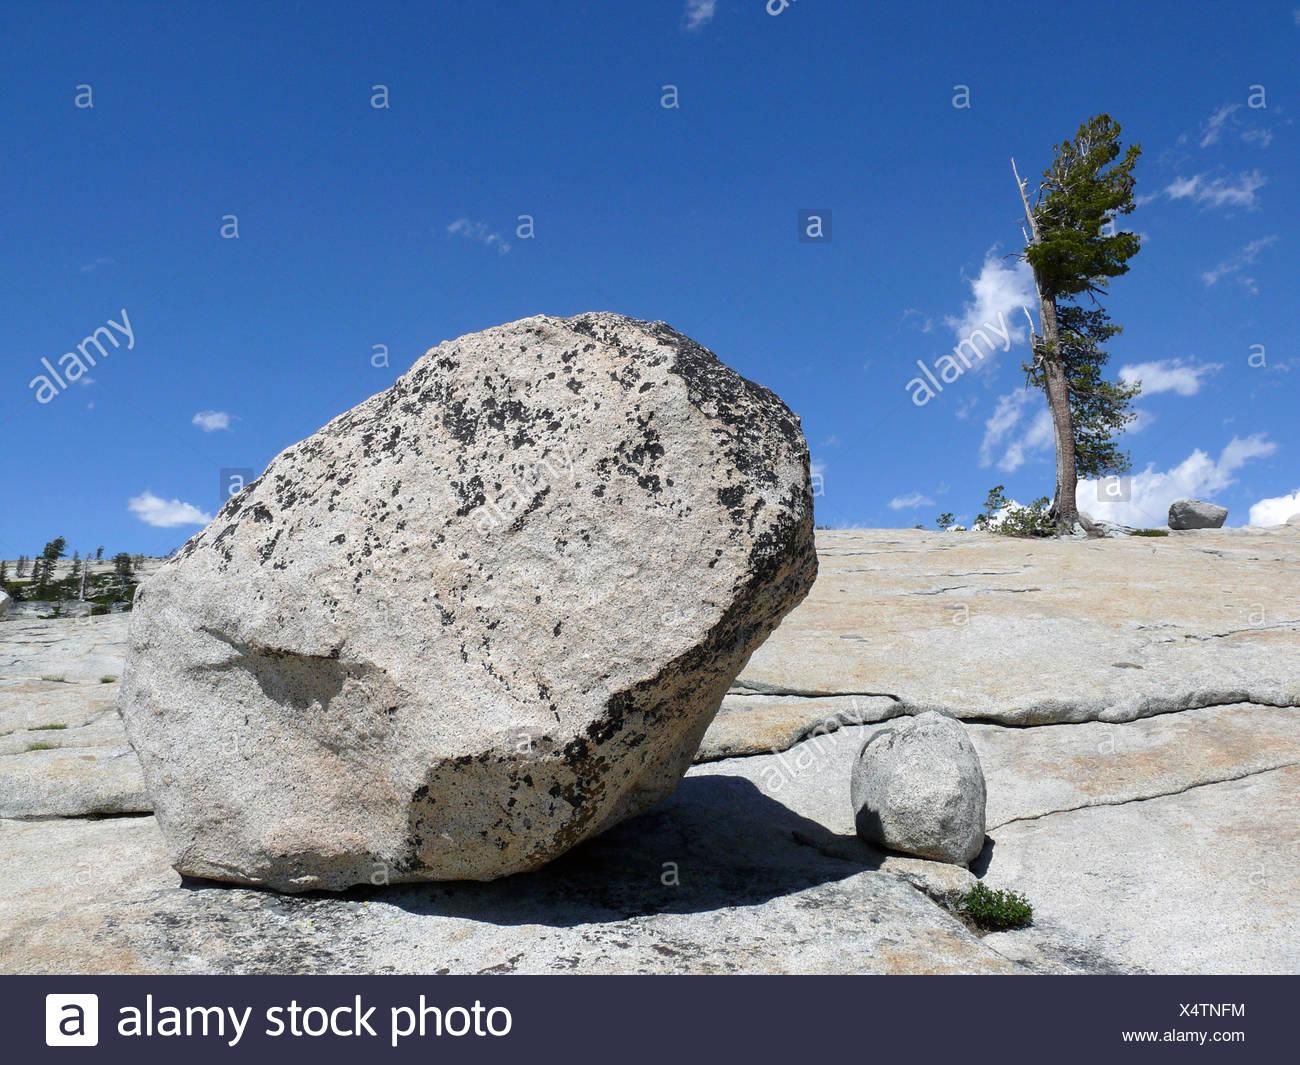 rock vs tree - Stock Image